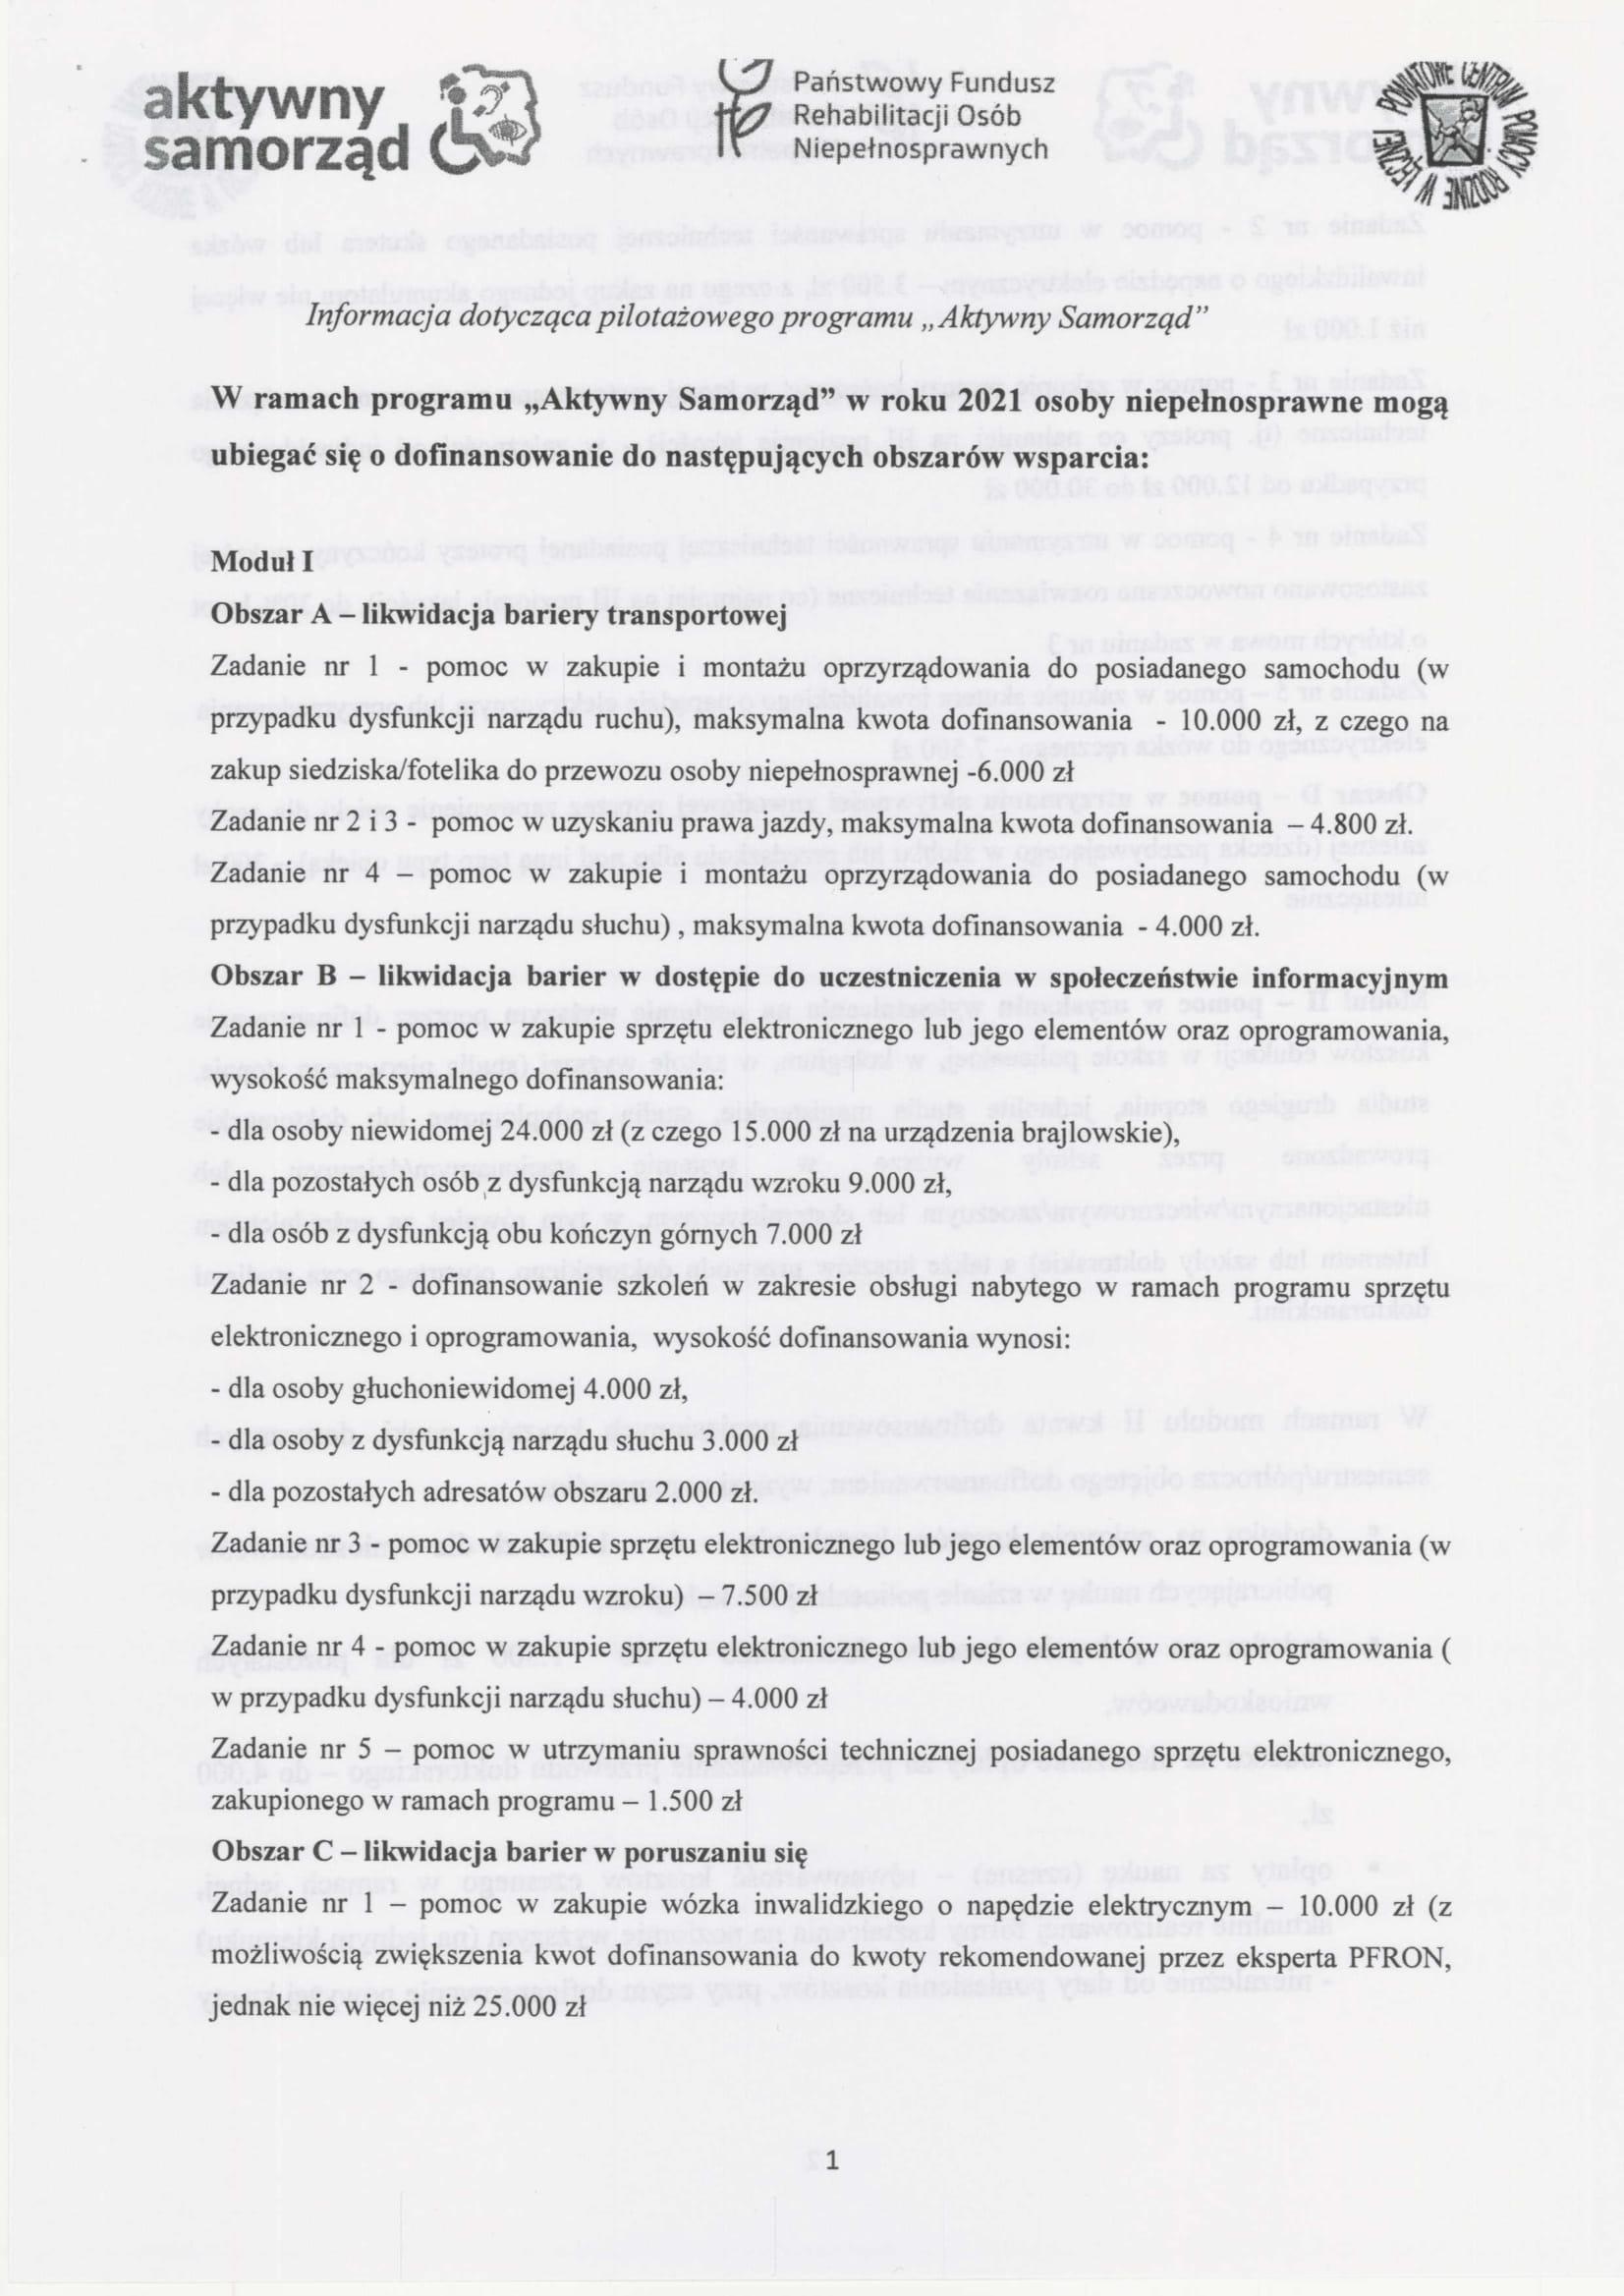 Application12021-3-110002-3jpg